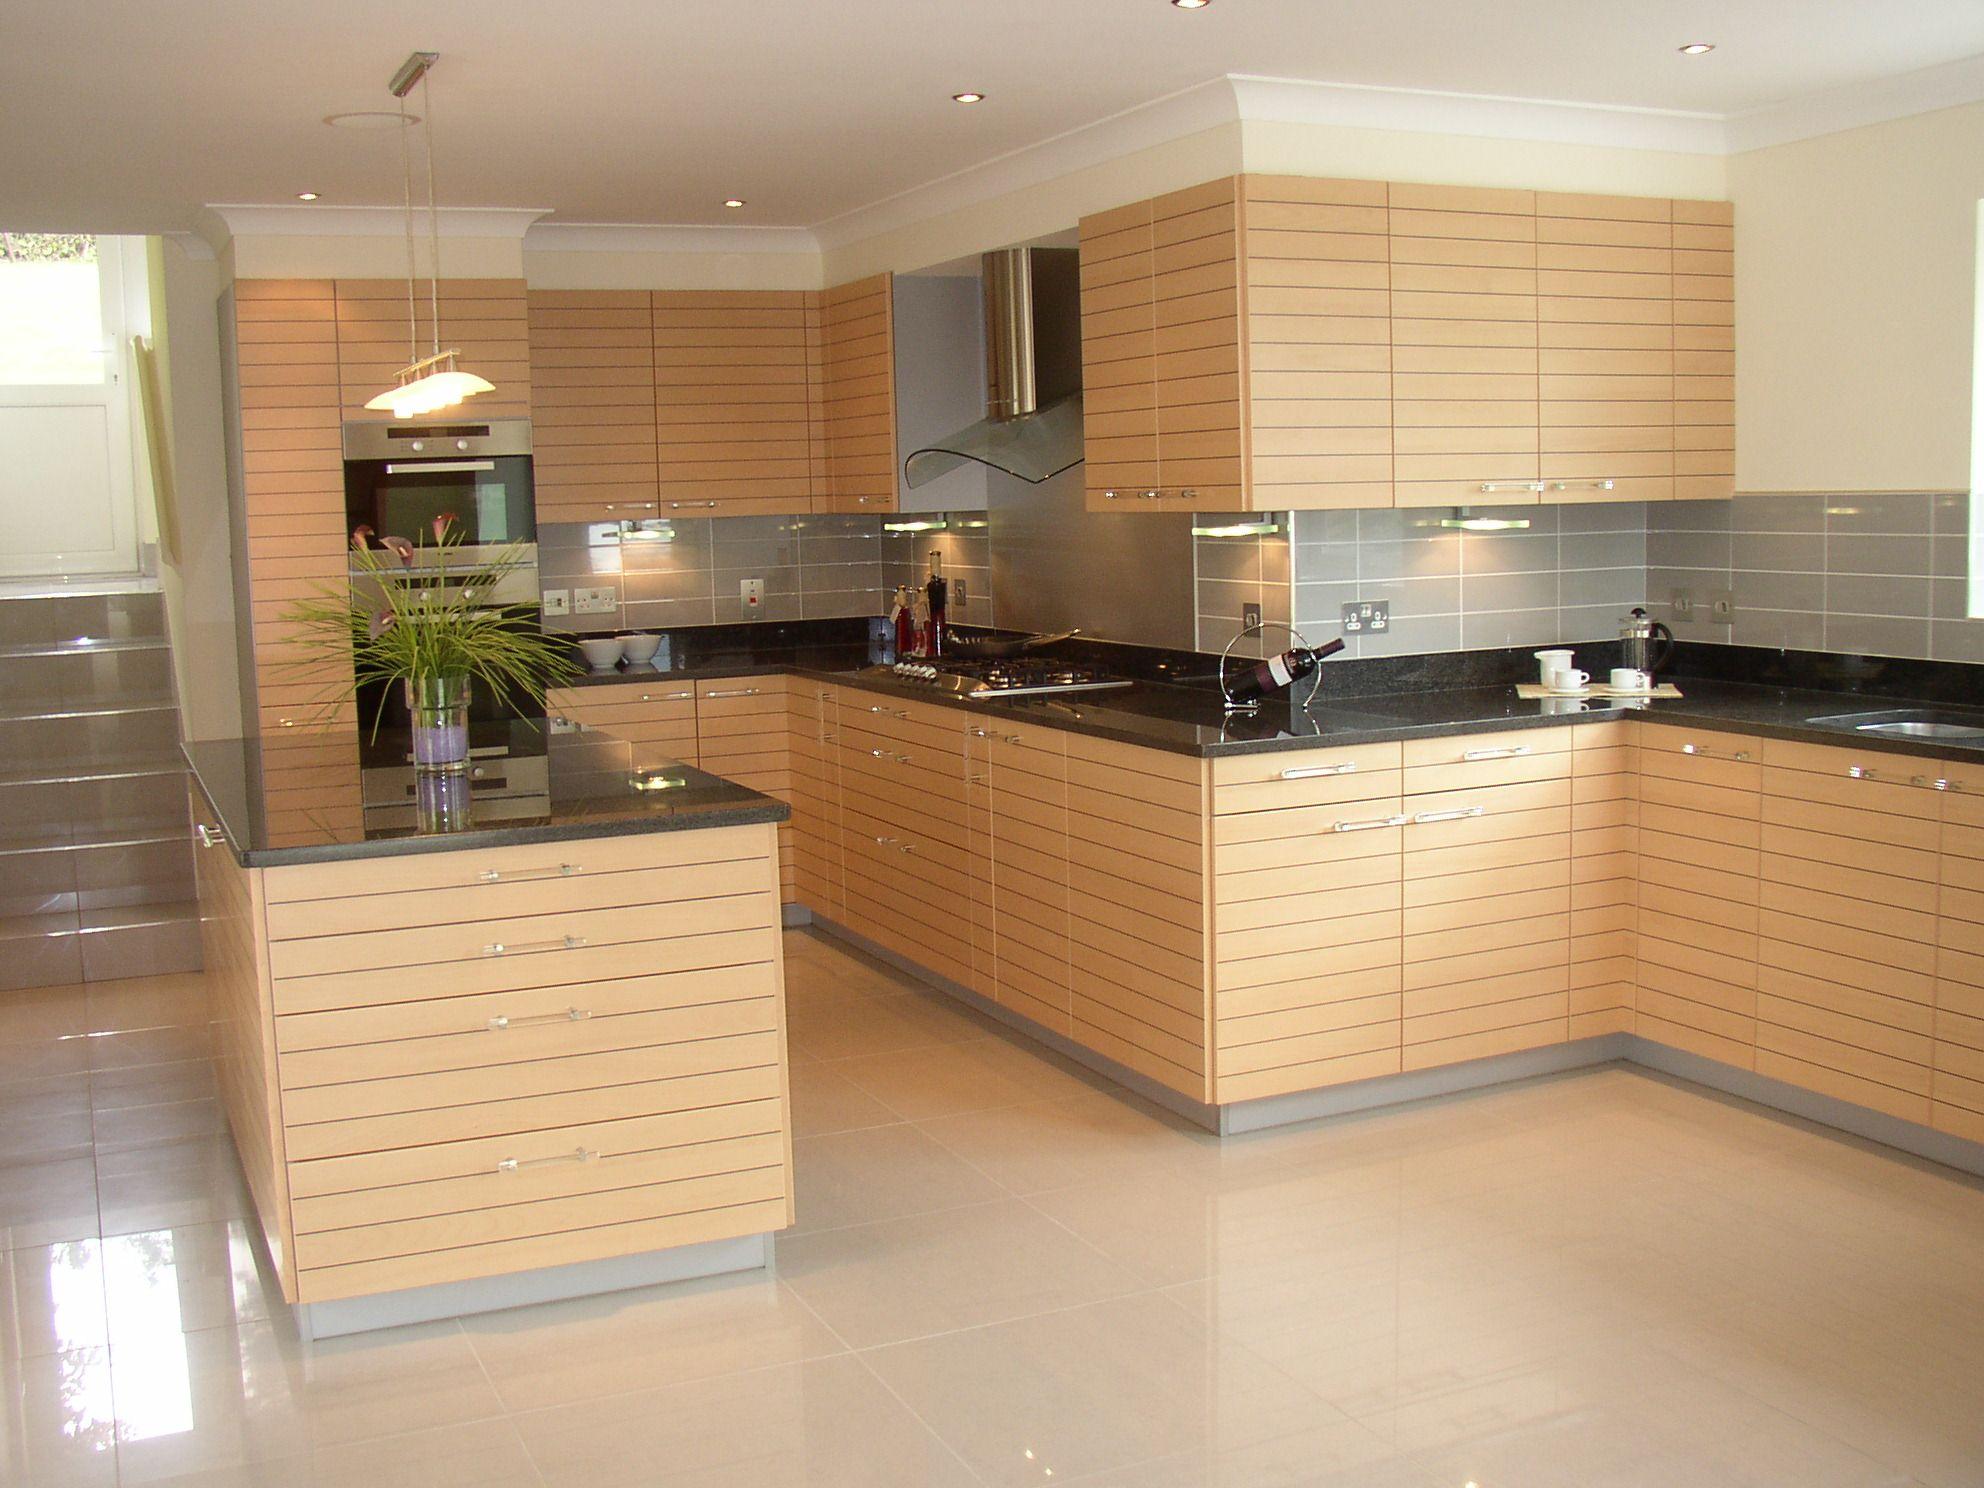 About alno modern kitchens on pinterest modern kitchen cabinets - Alno Line Kitchen Modern Kitchens